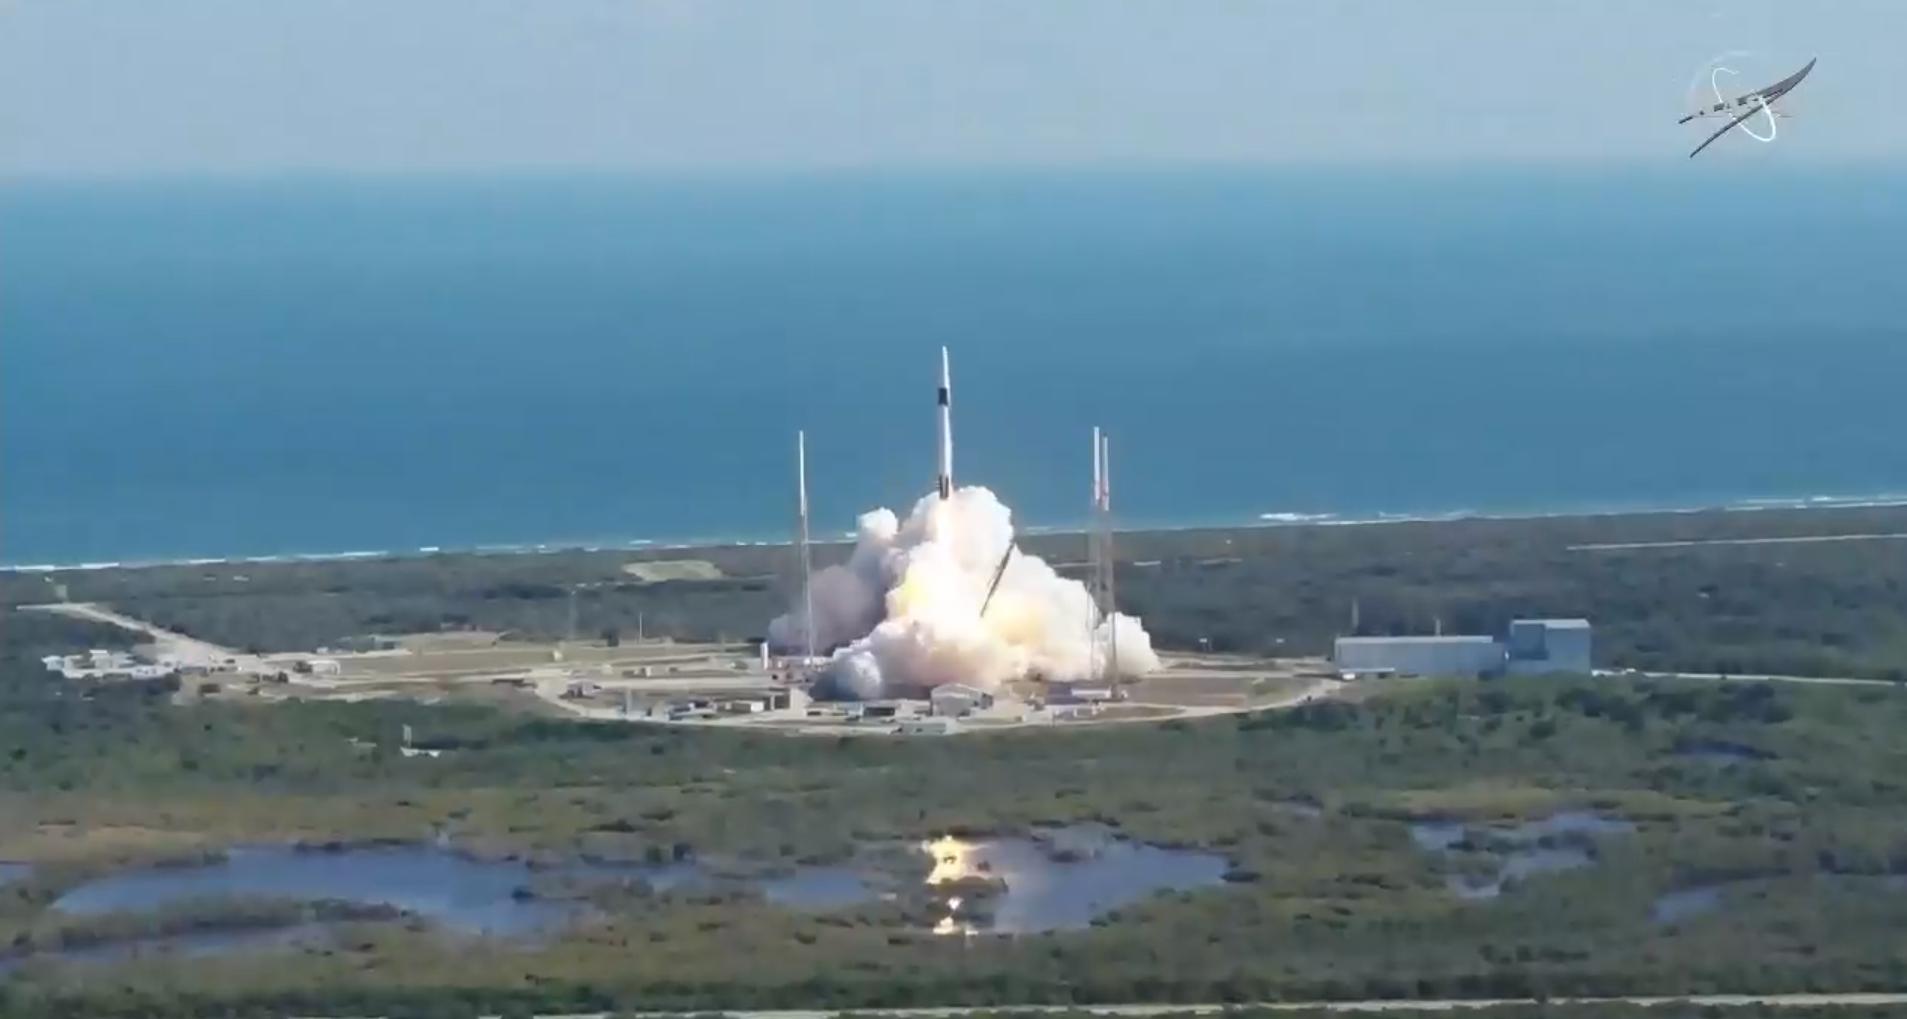 https://www.nasa.gov/sites/default/files/thumbnails/image/launch_1.png